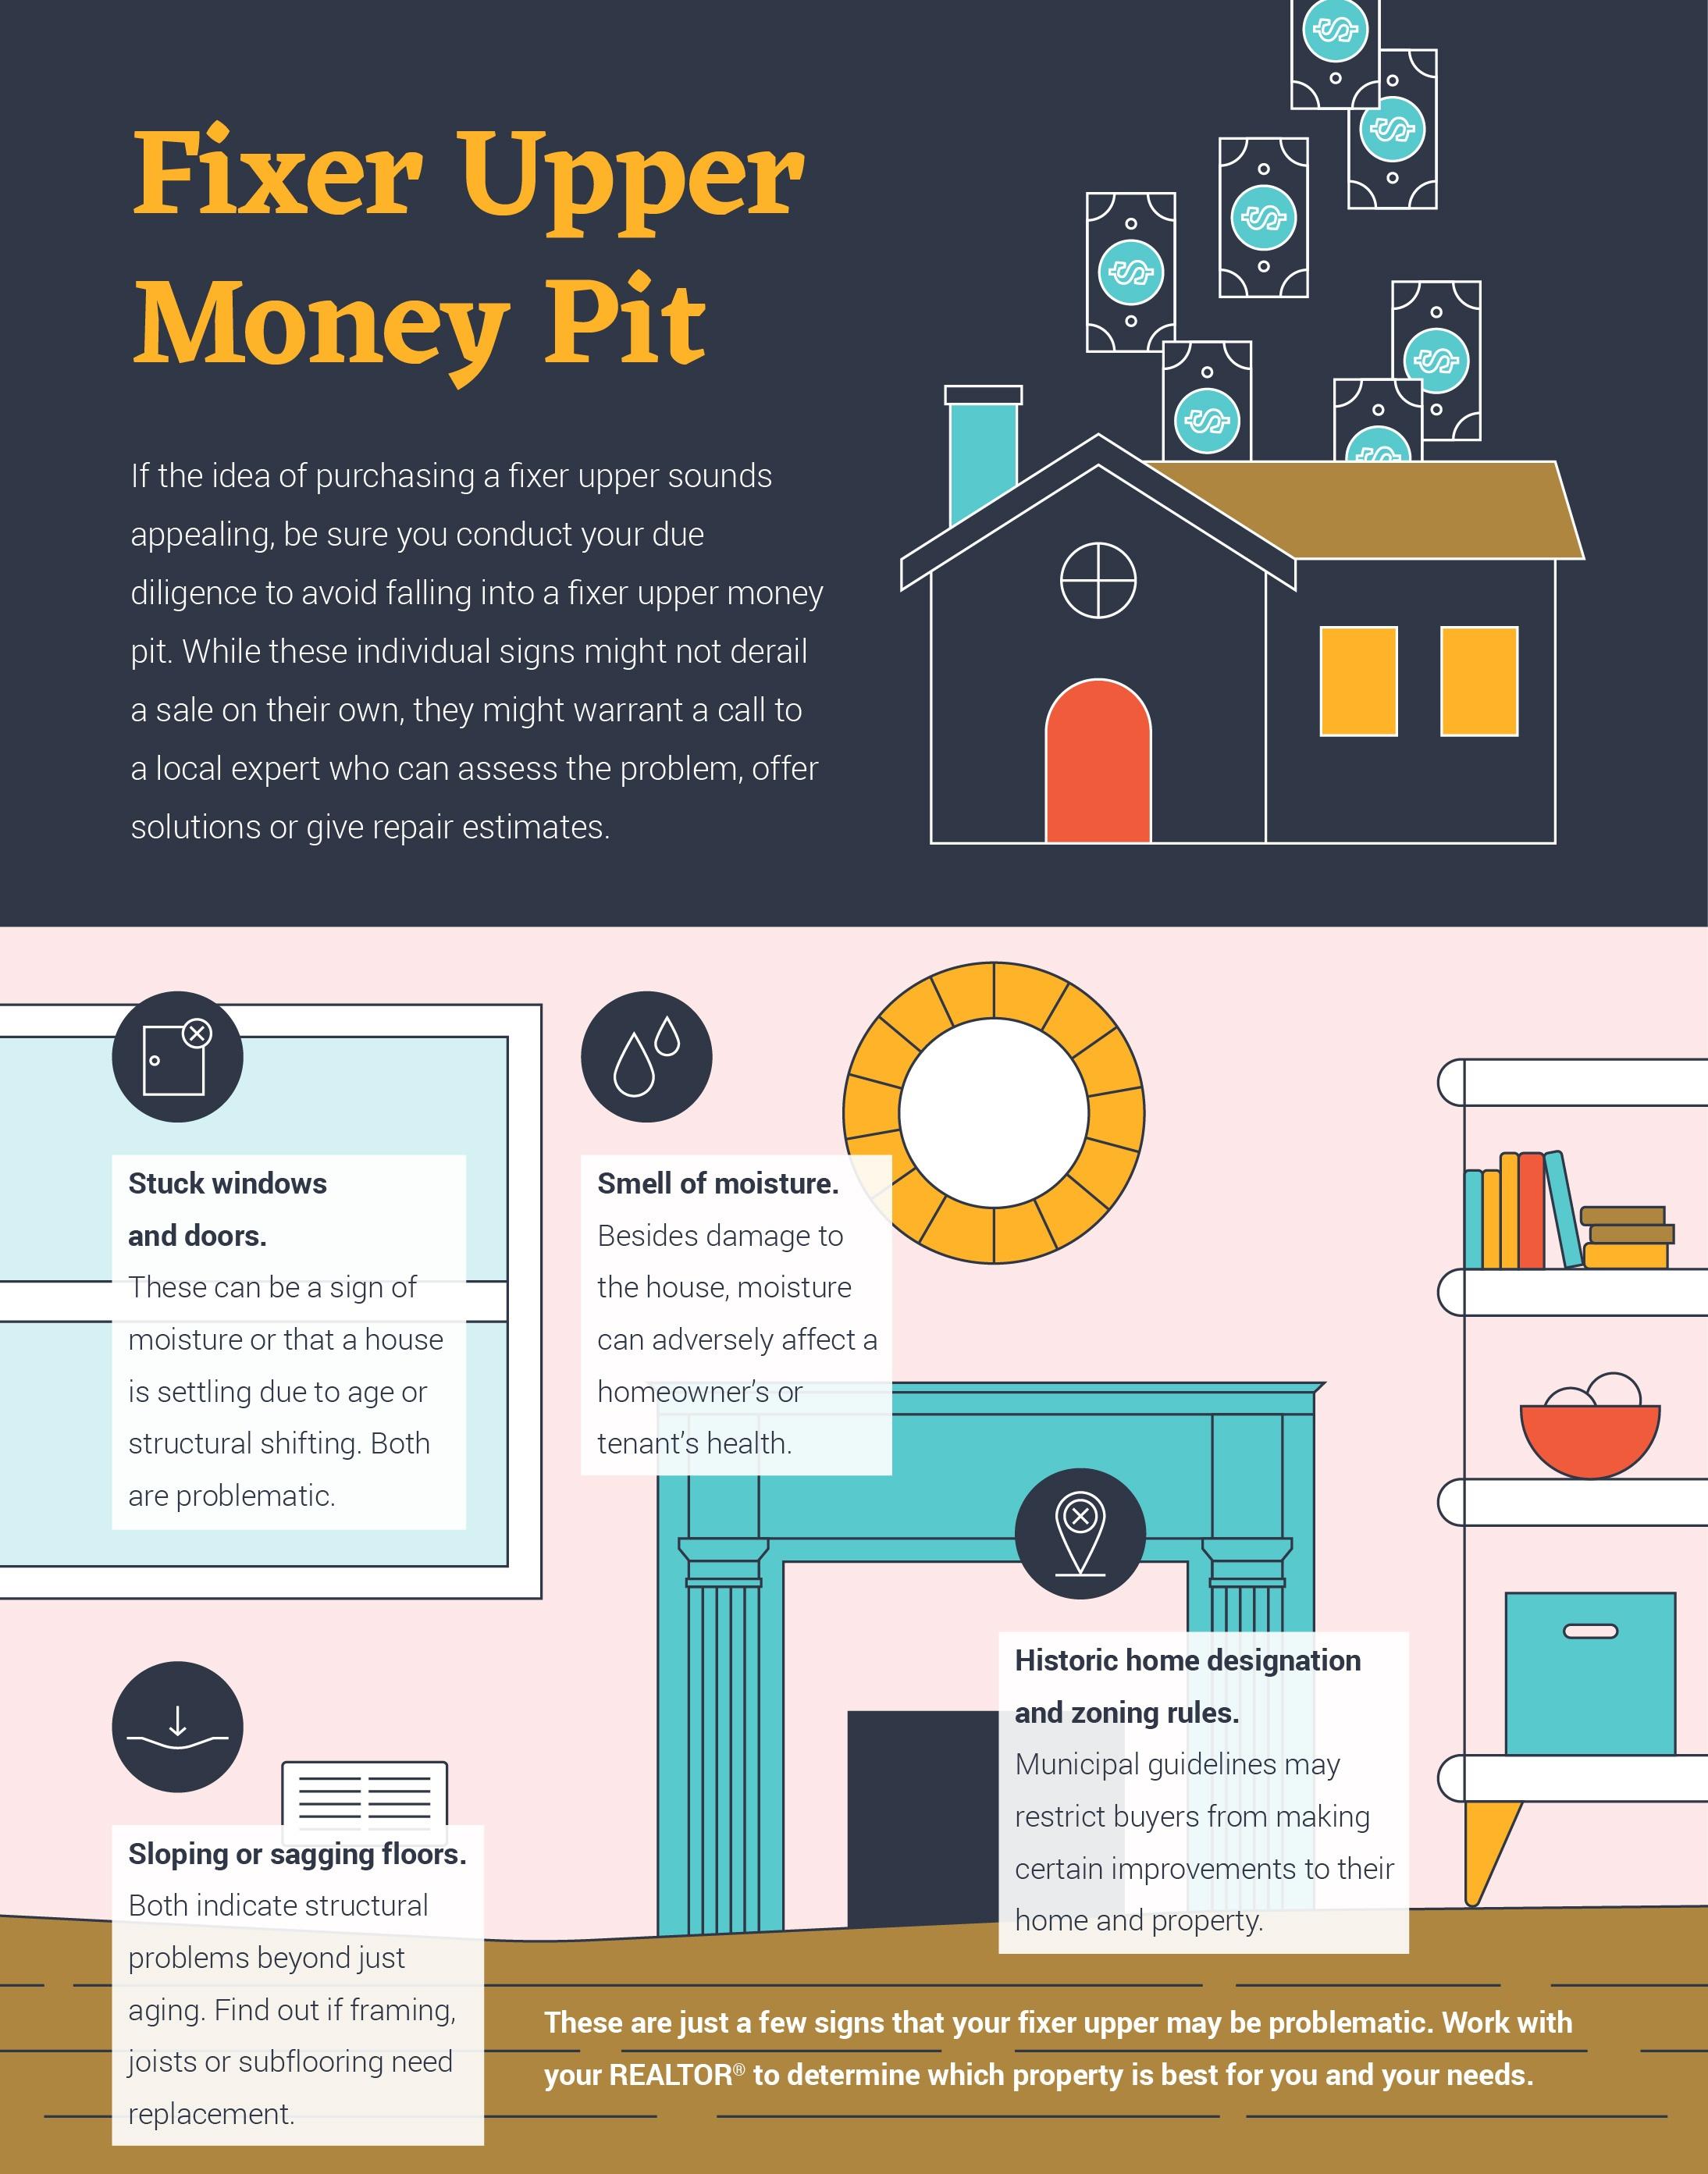 Fixer-Upper-Money Pit.jpg